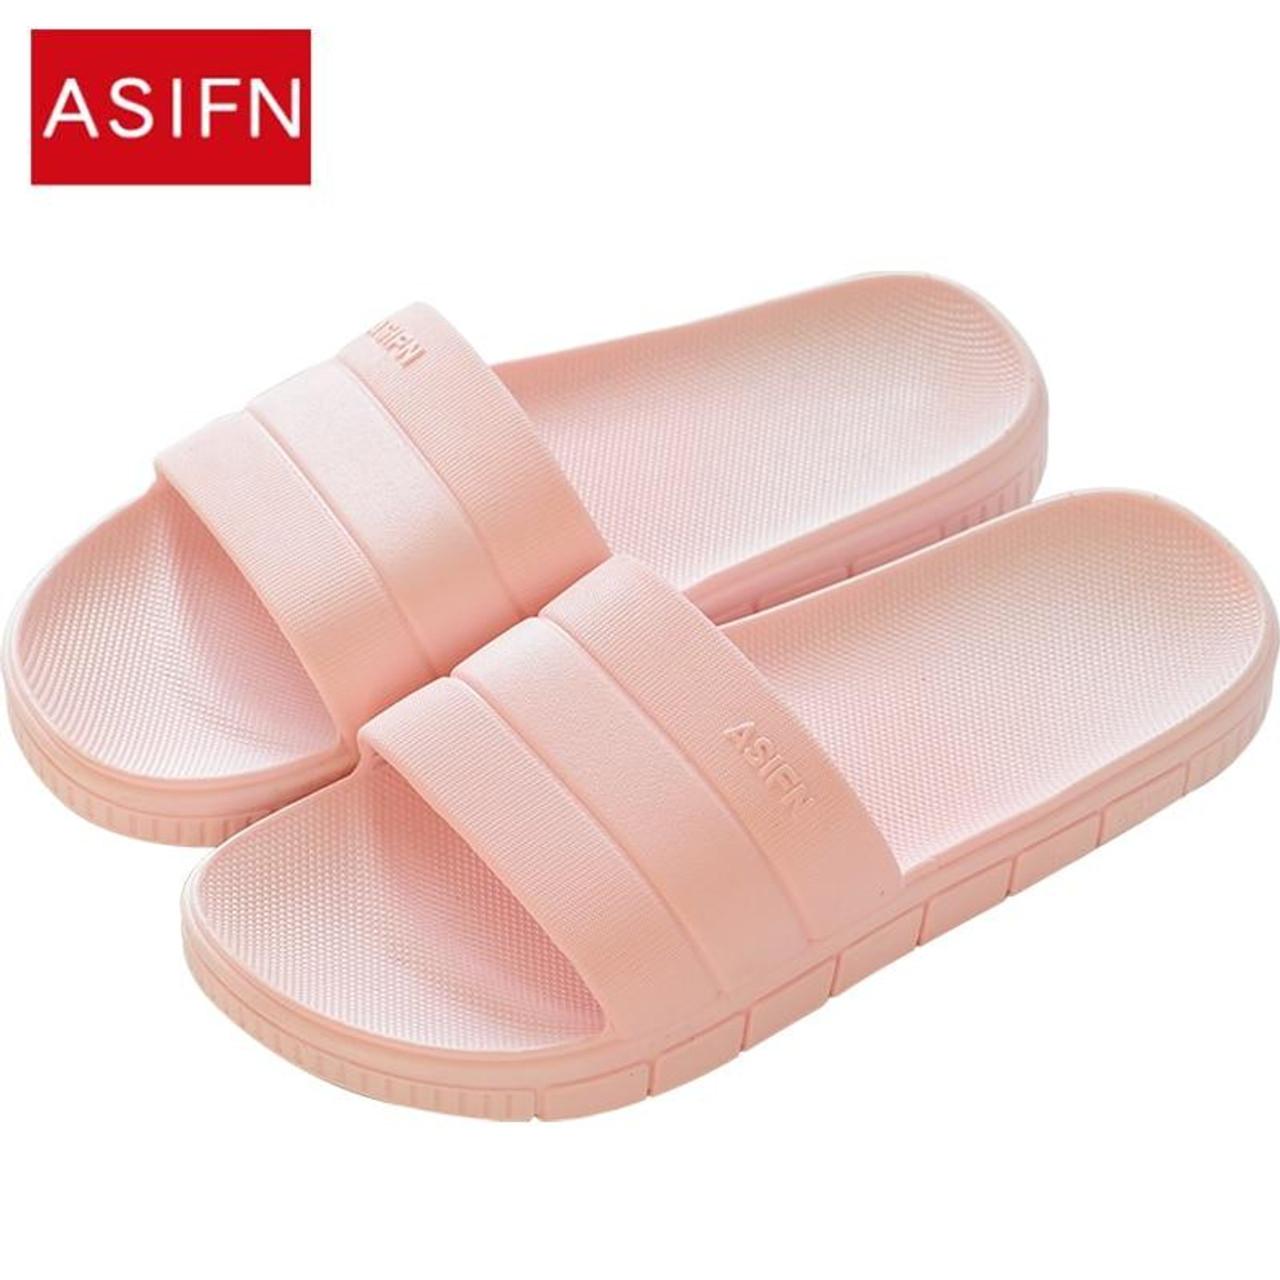 ASIFN Women's Slippers Woman Shoes Non